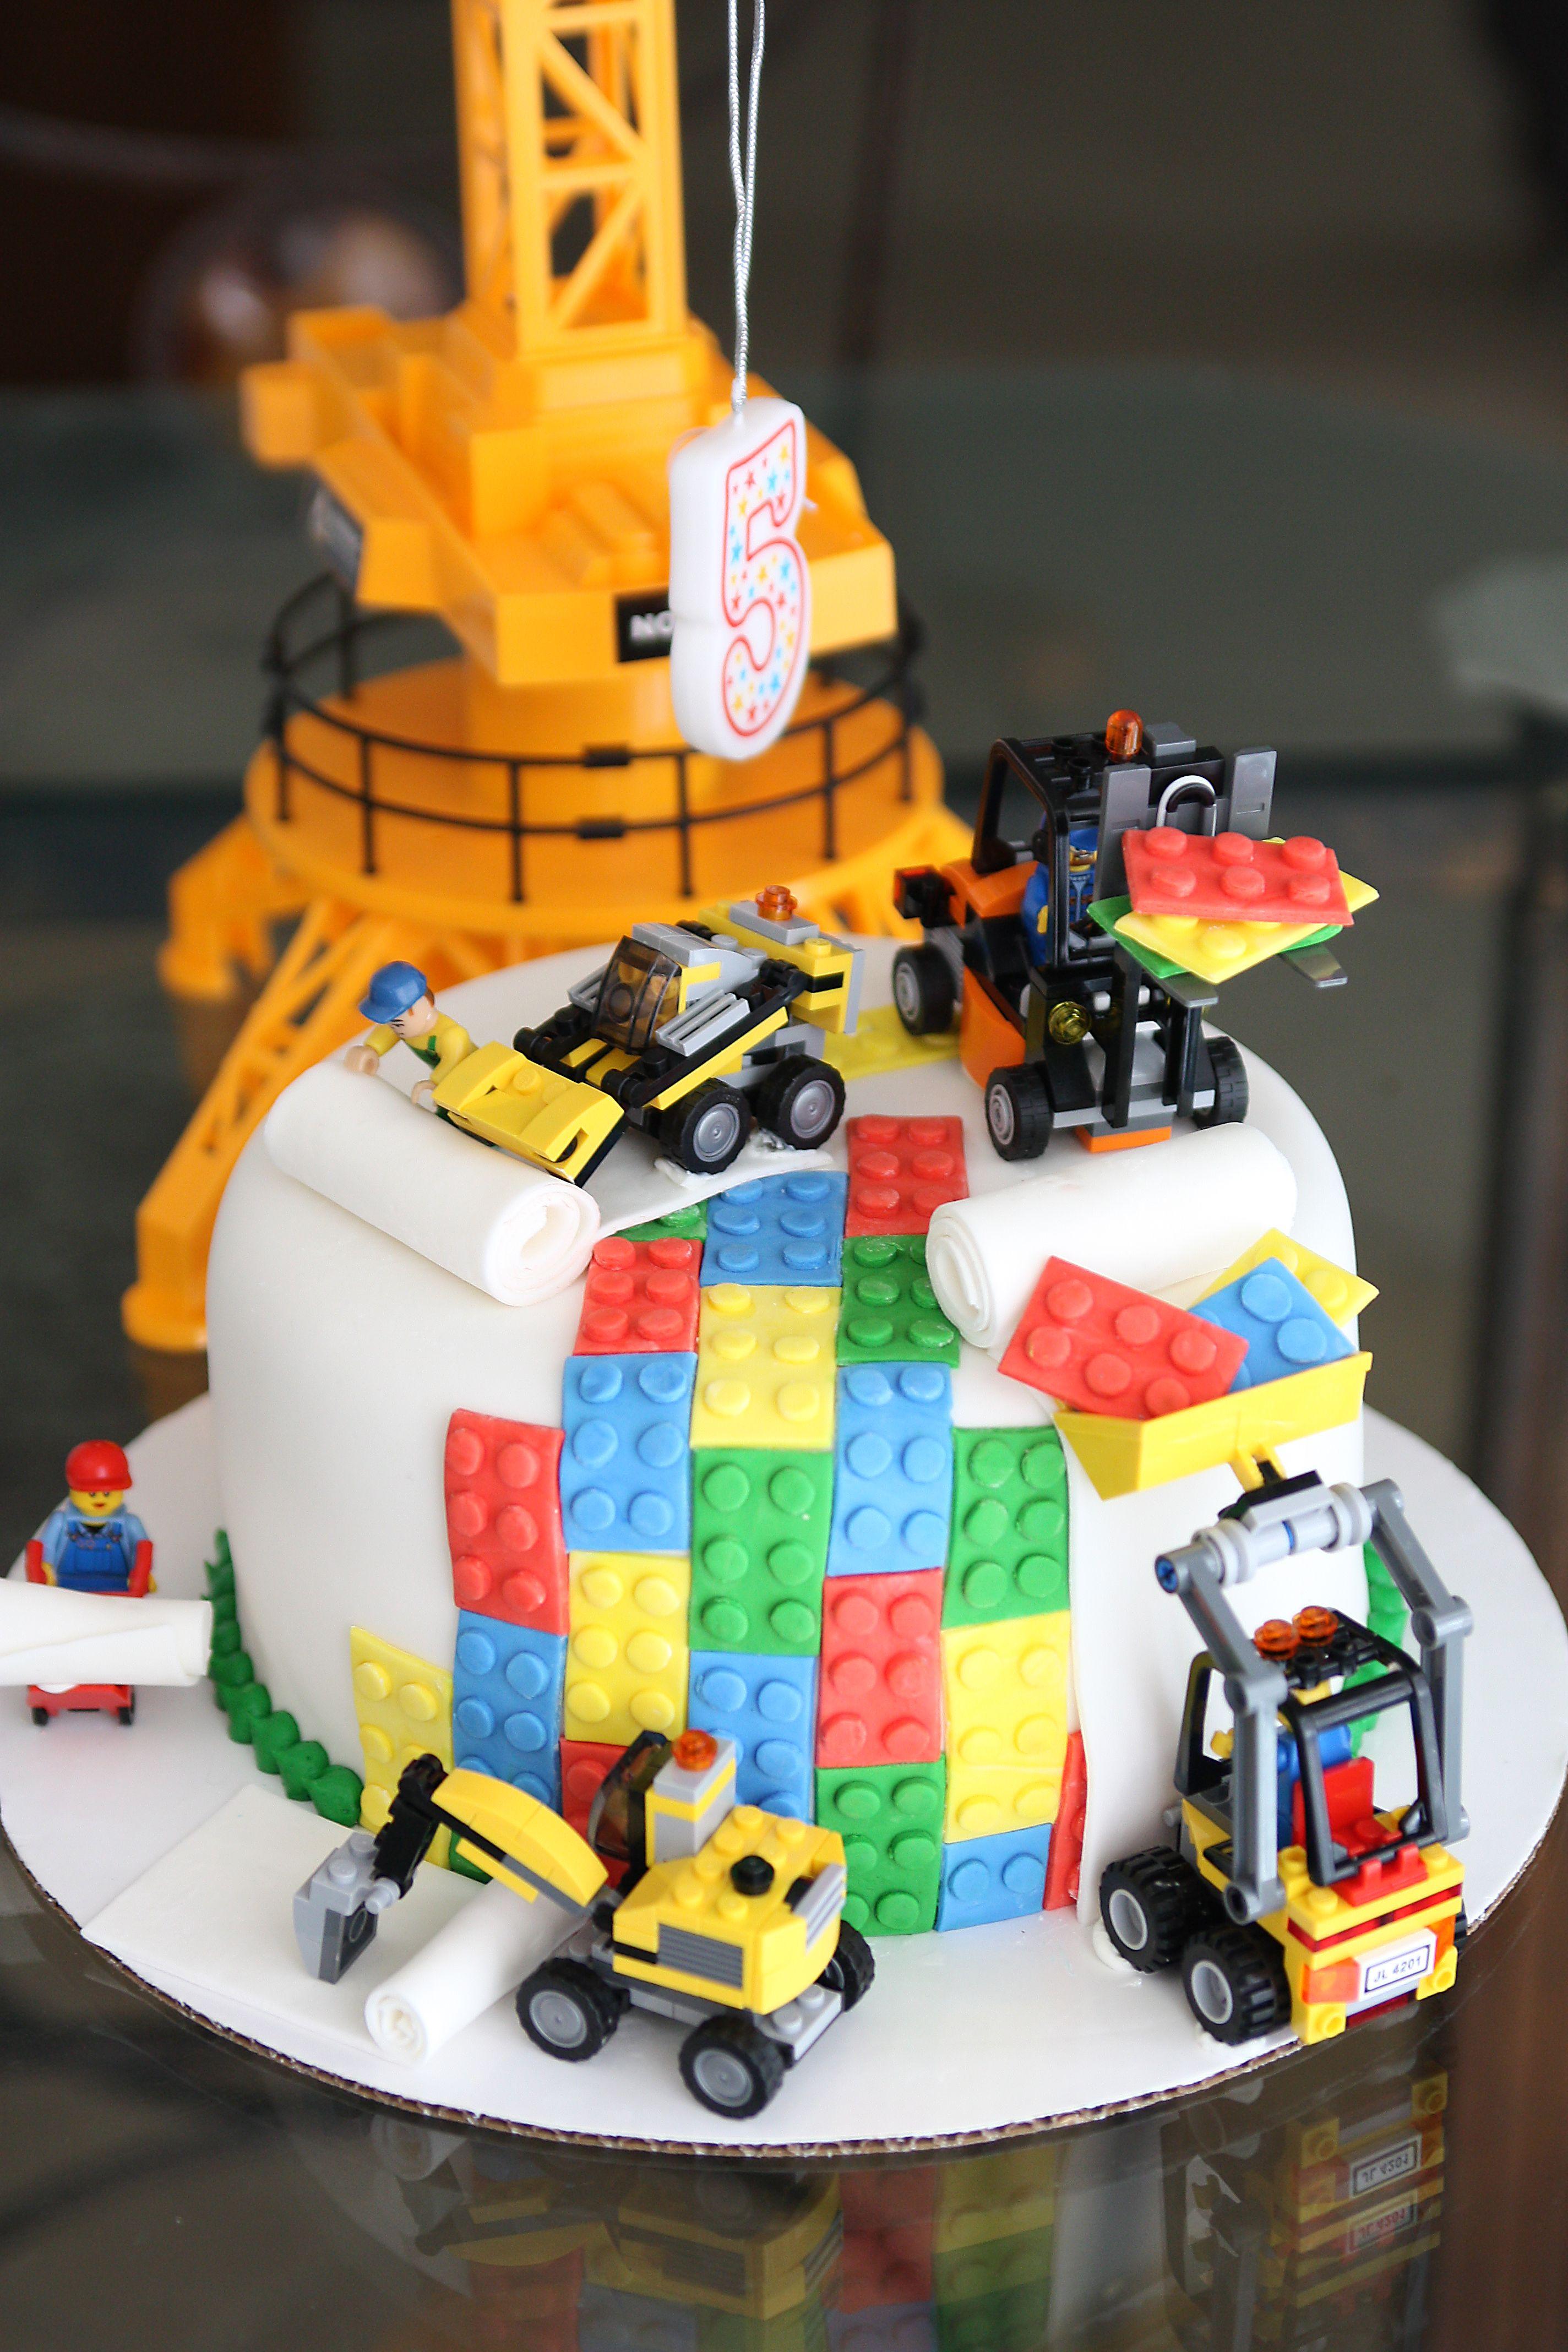 An Amazing Lego Cake My Little Boy Is 5